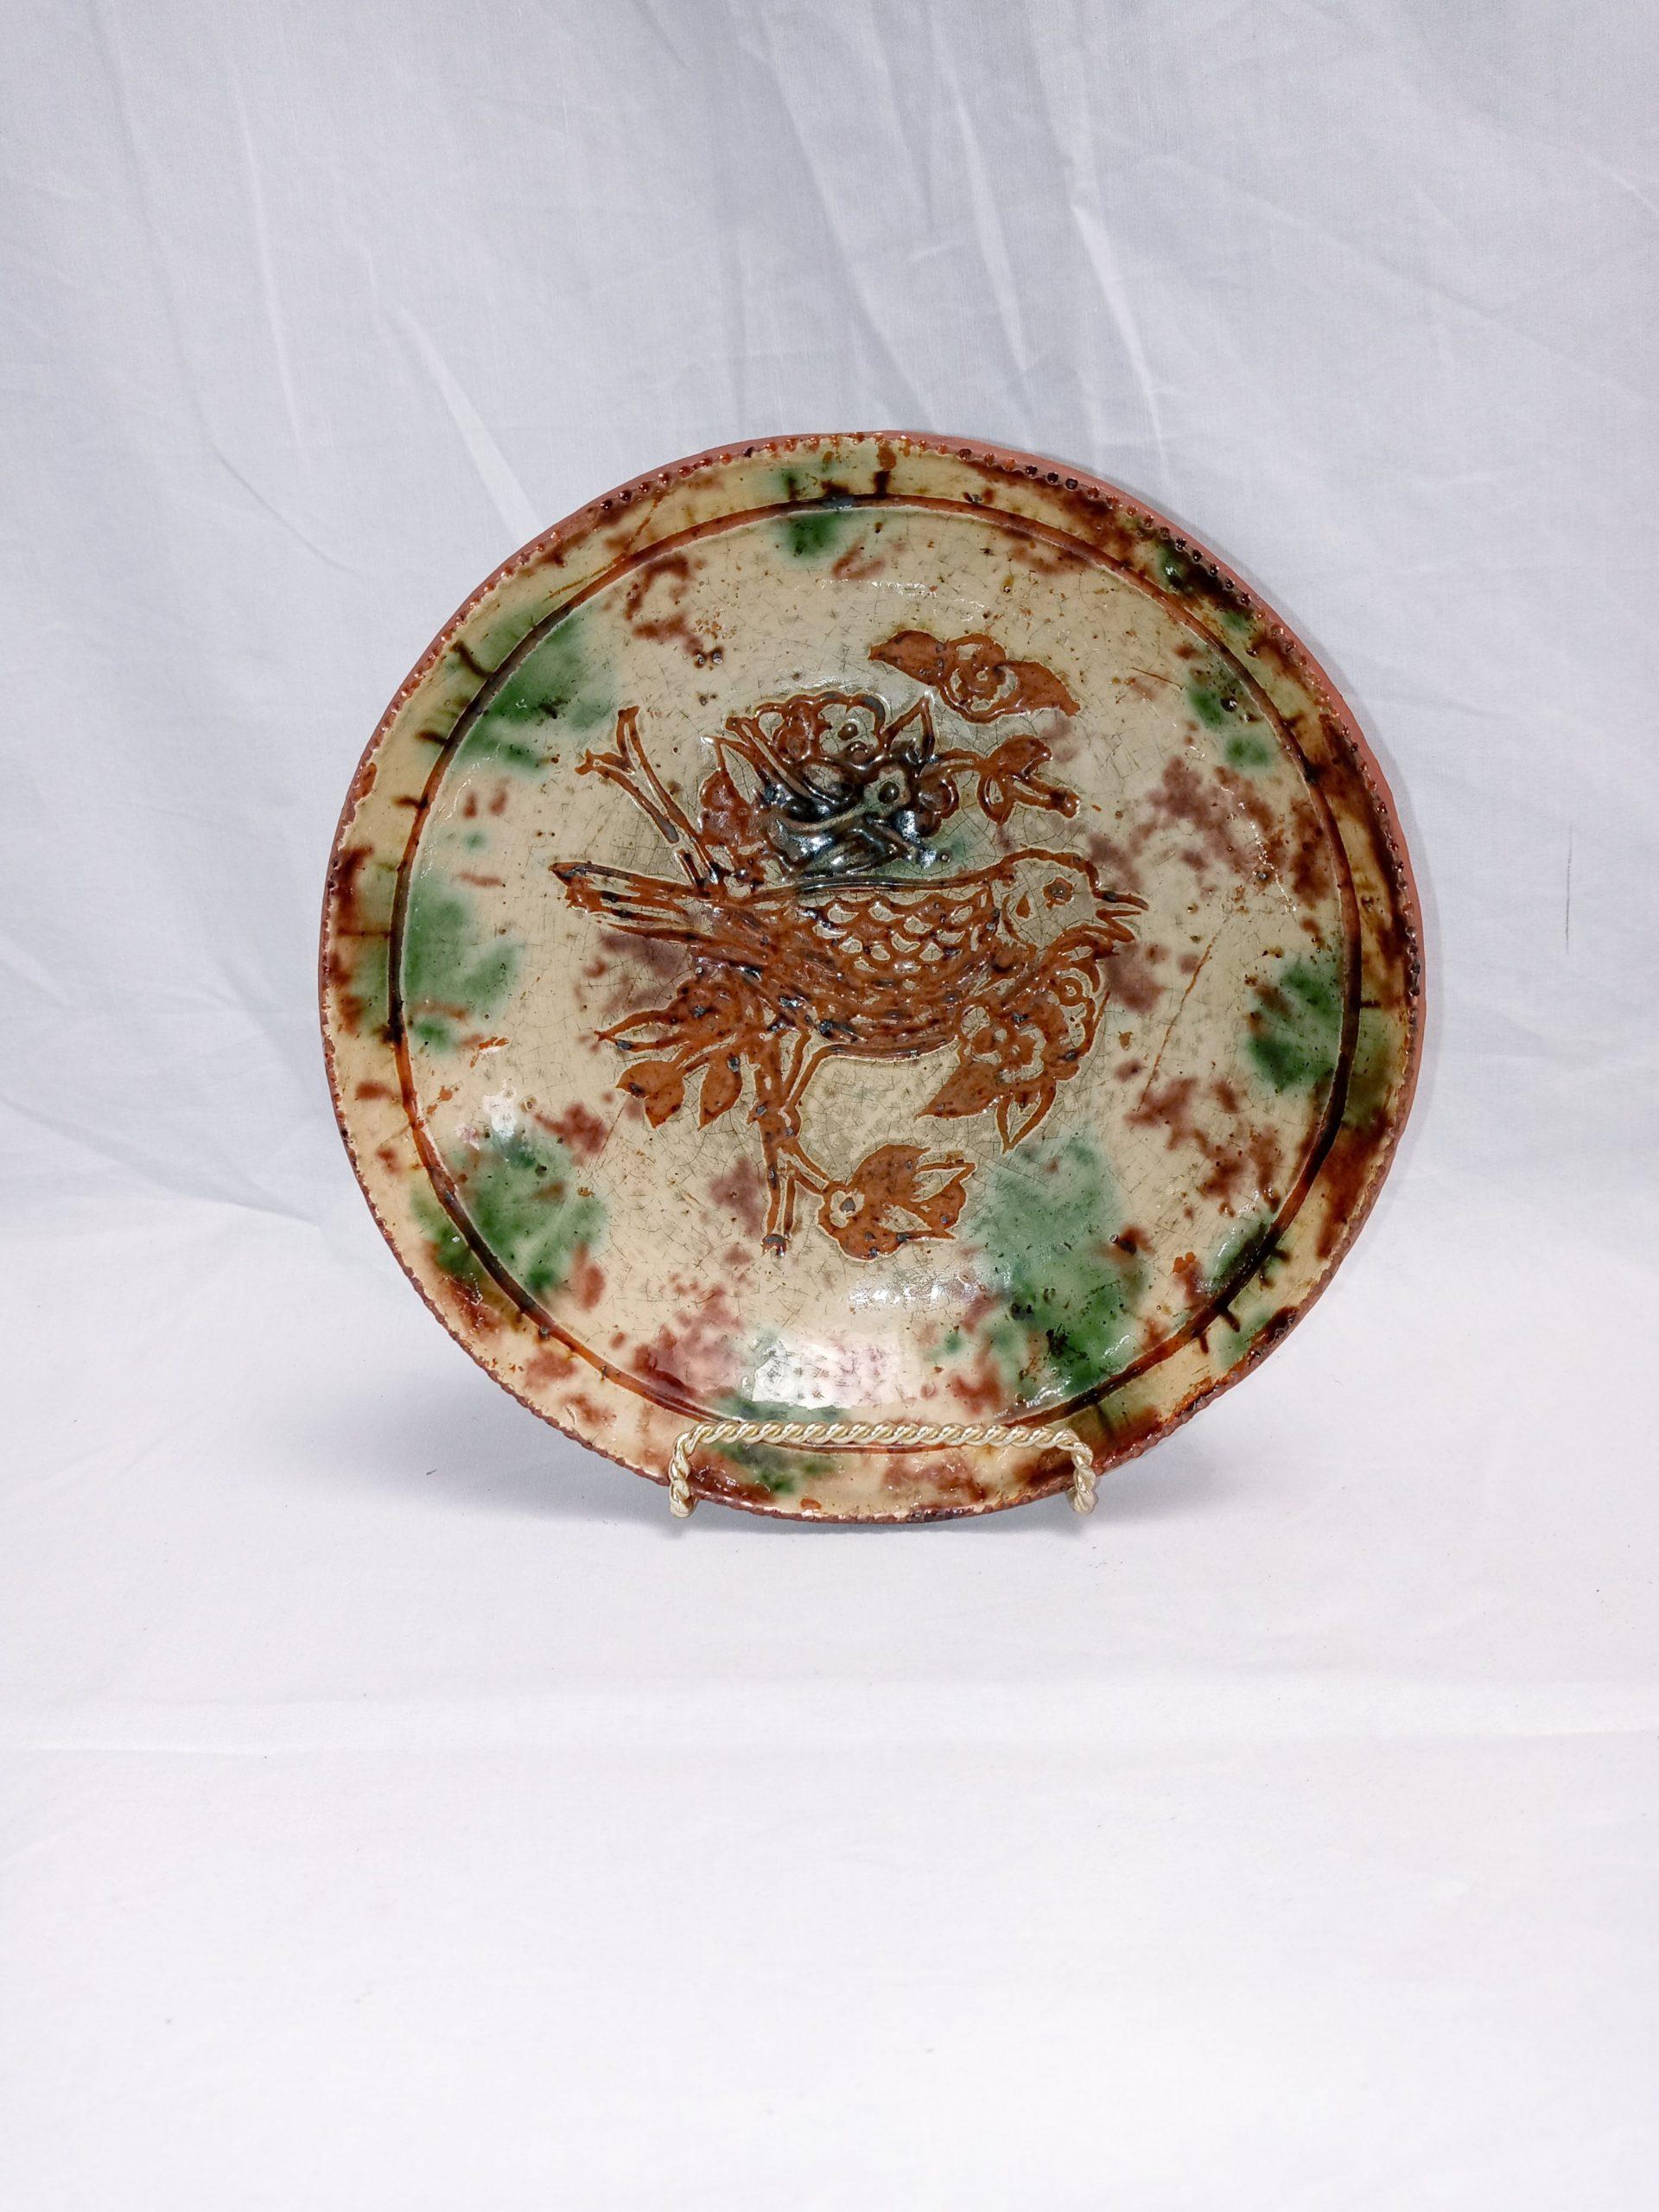 200-35742 Pennsylvania Redware Pottery Sgraffito Plate Image